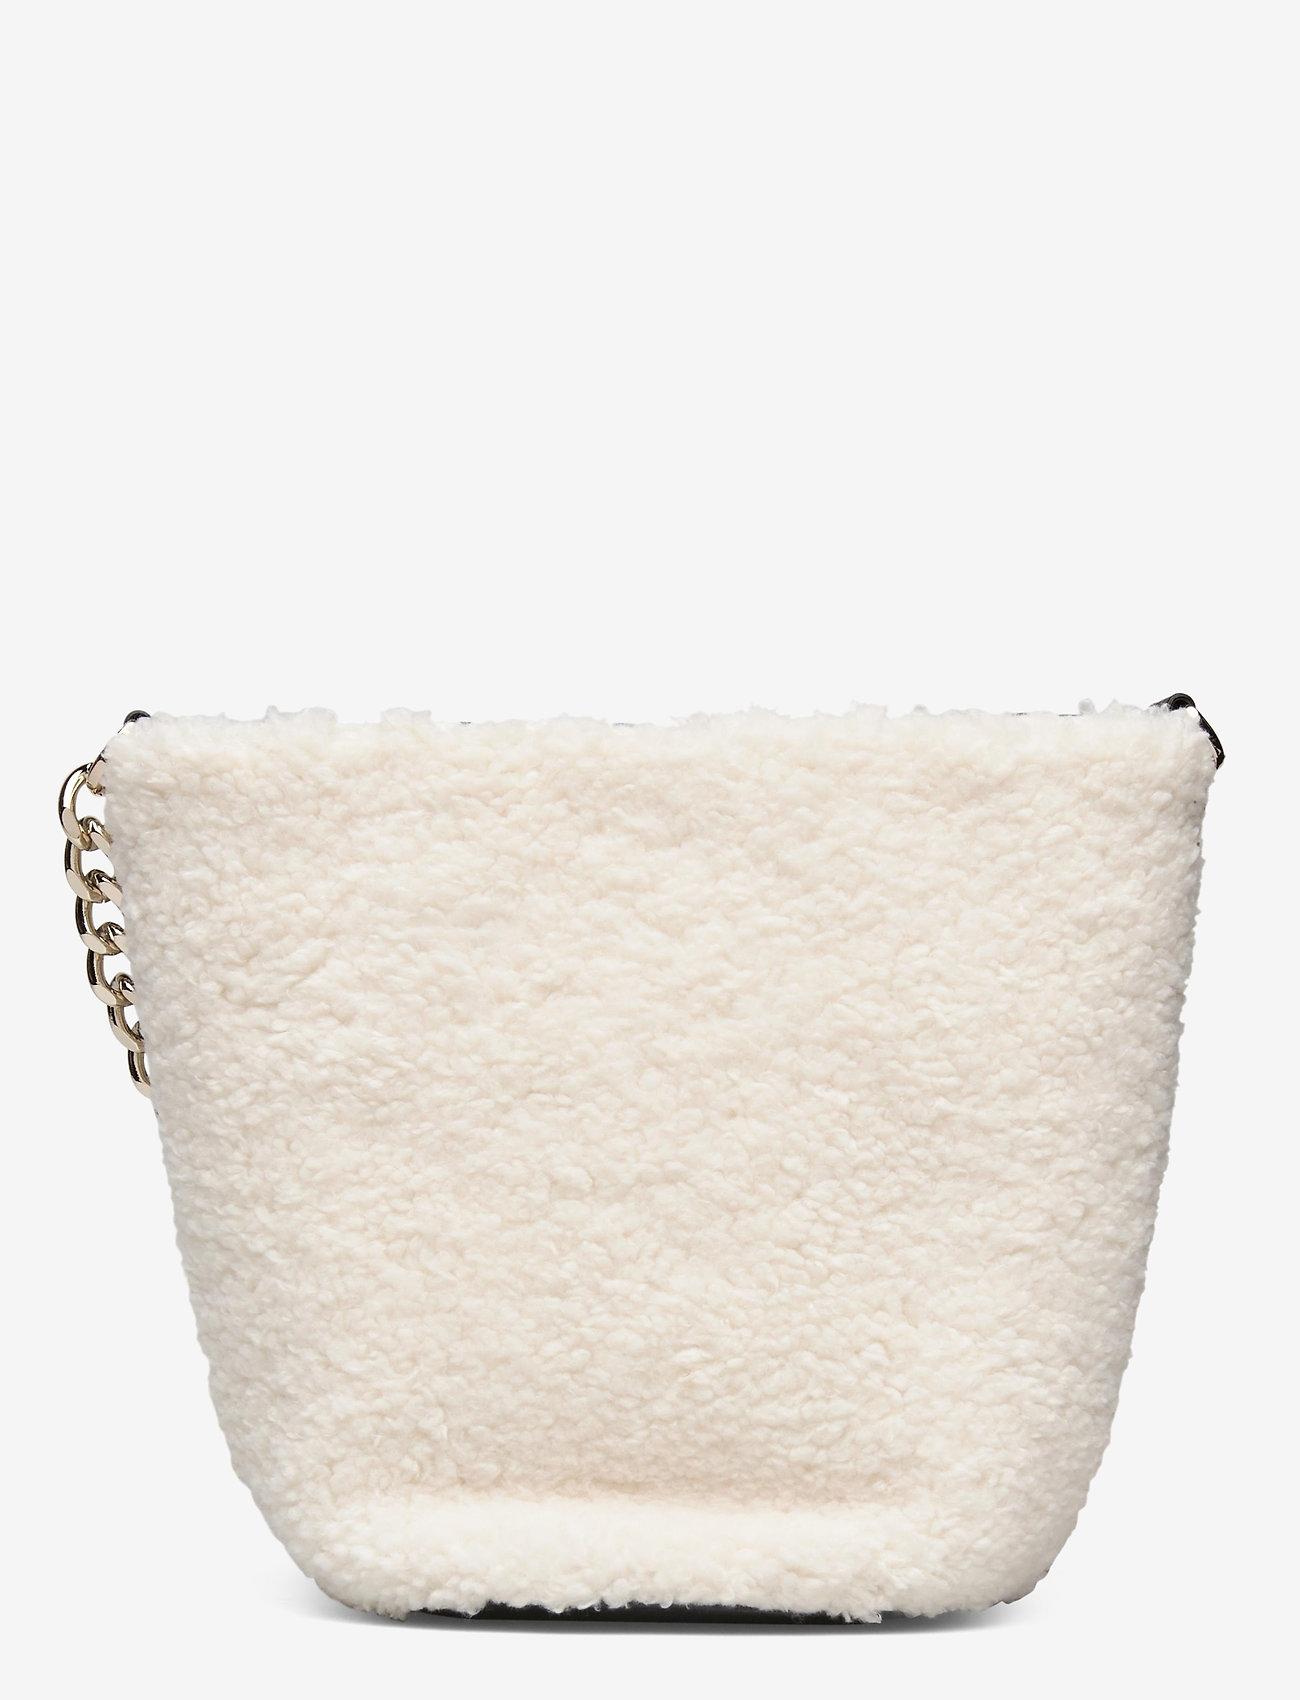 DKNY Bags - HANDBAG - bucket bags - ivory - 1